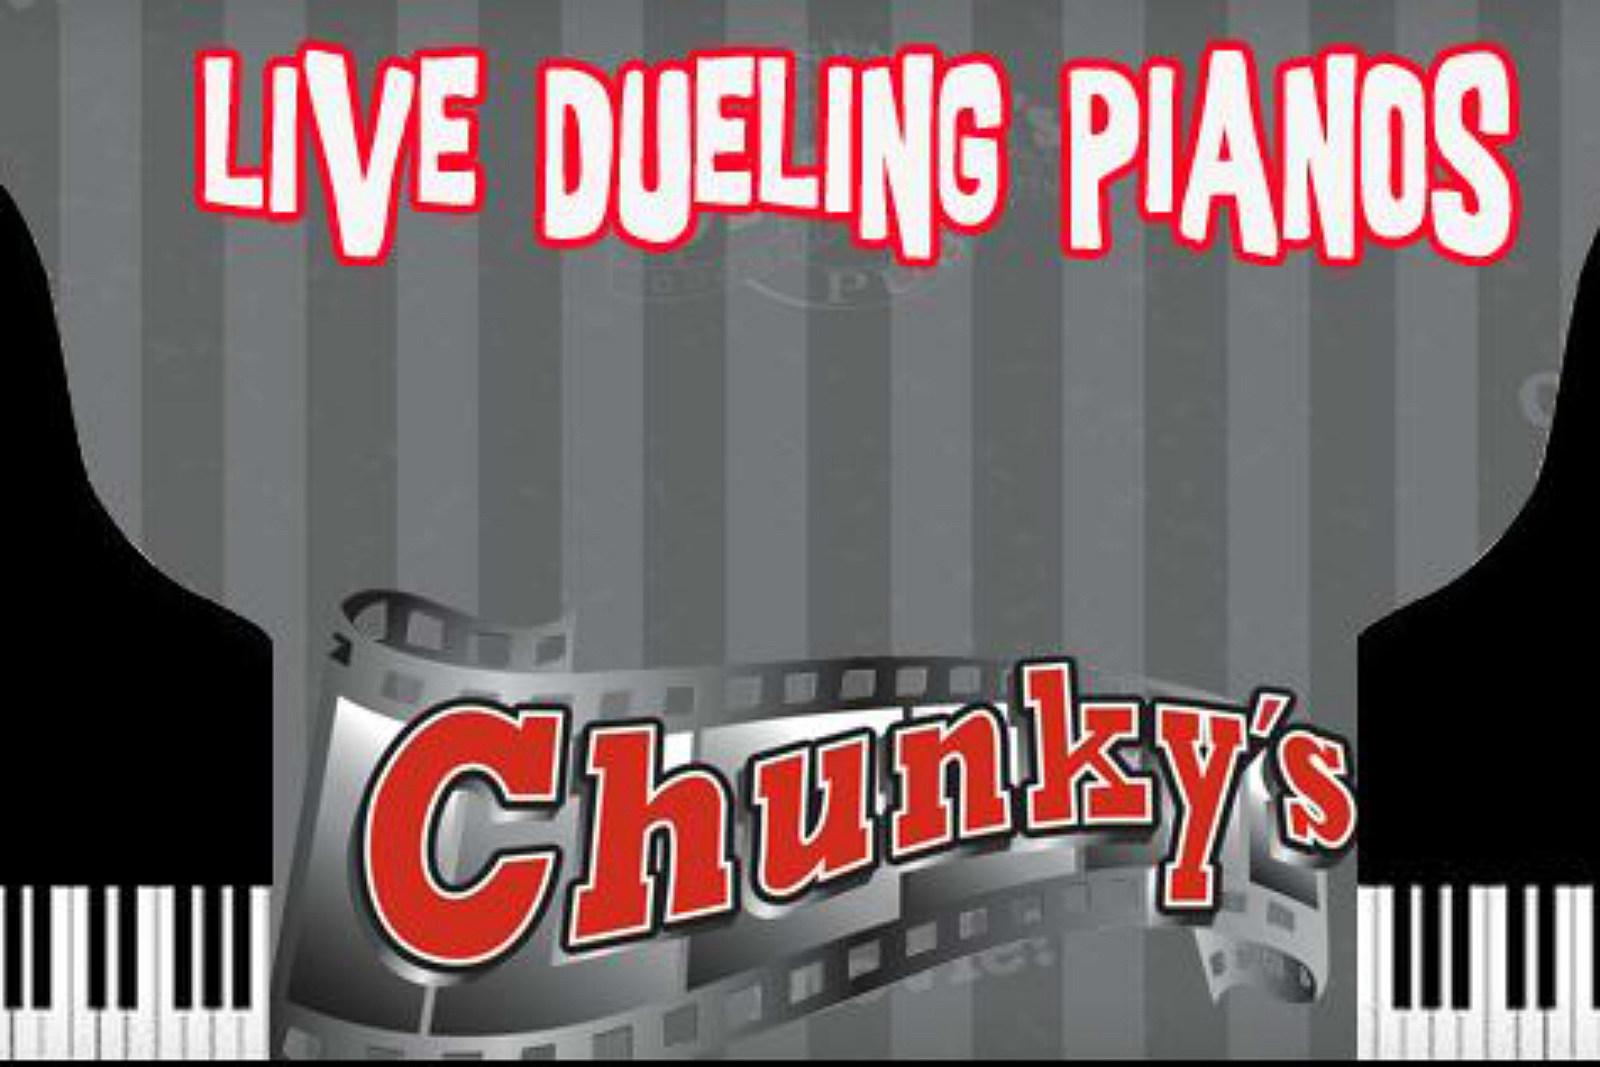 Chunky's Manchester via Facebook